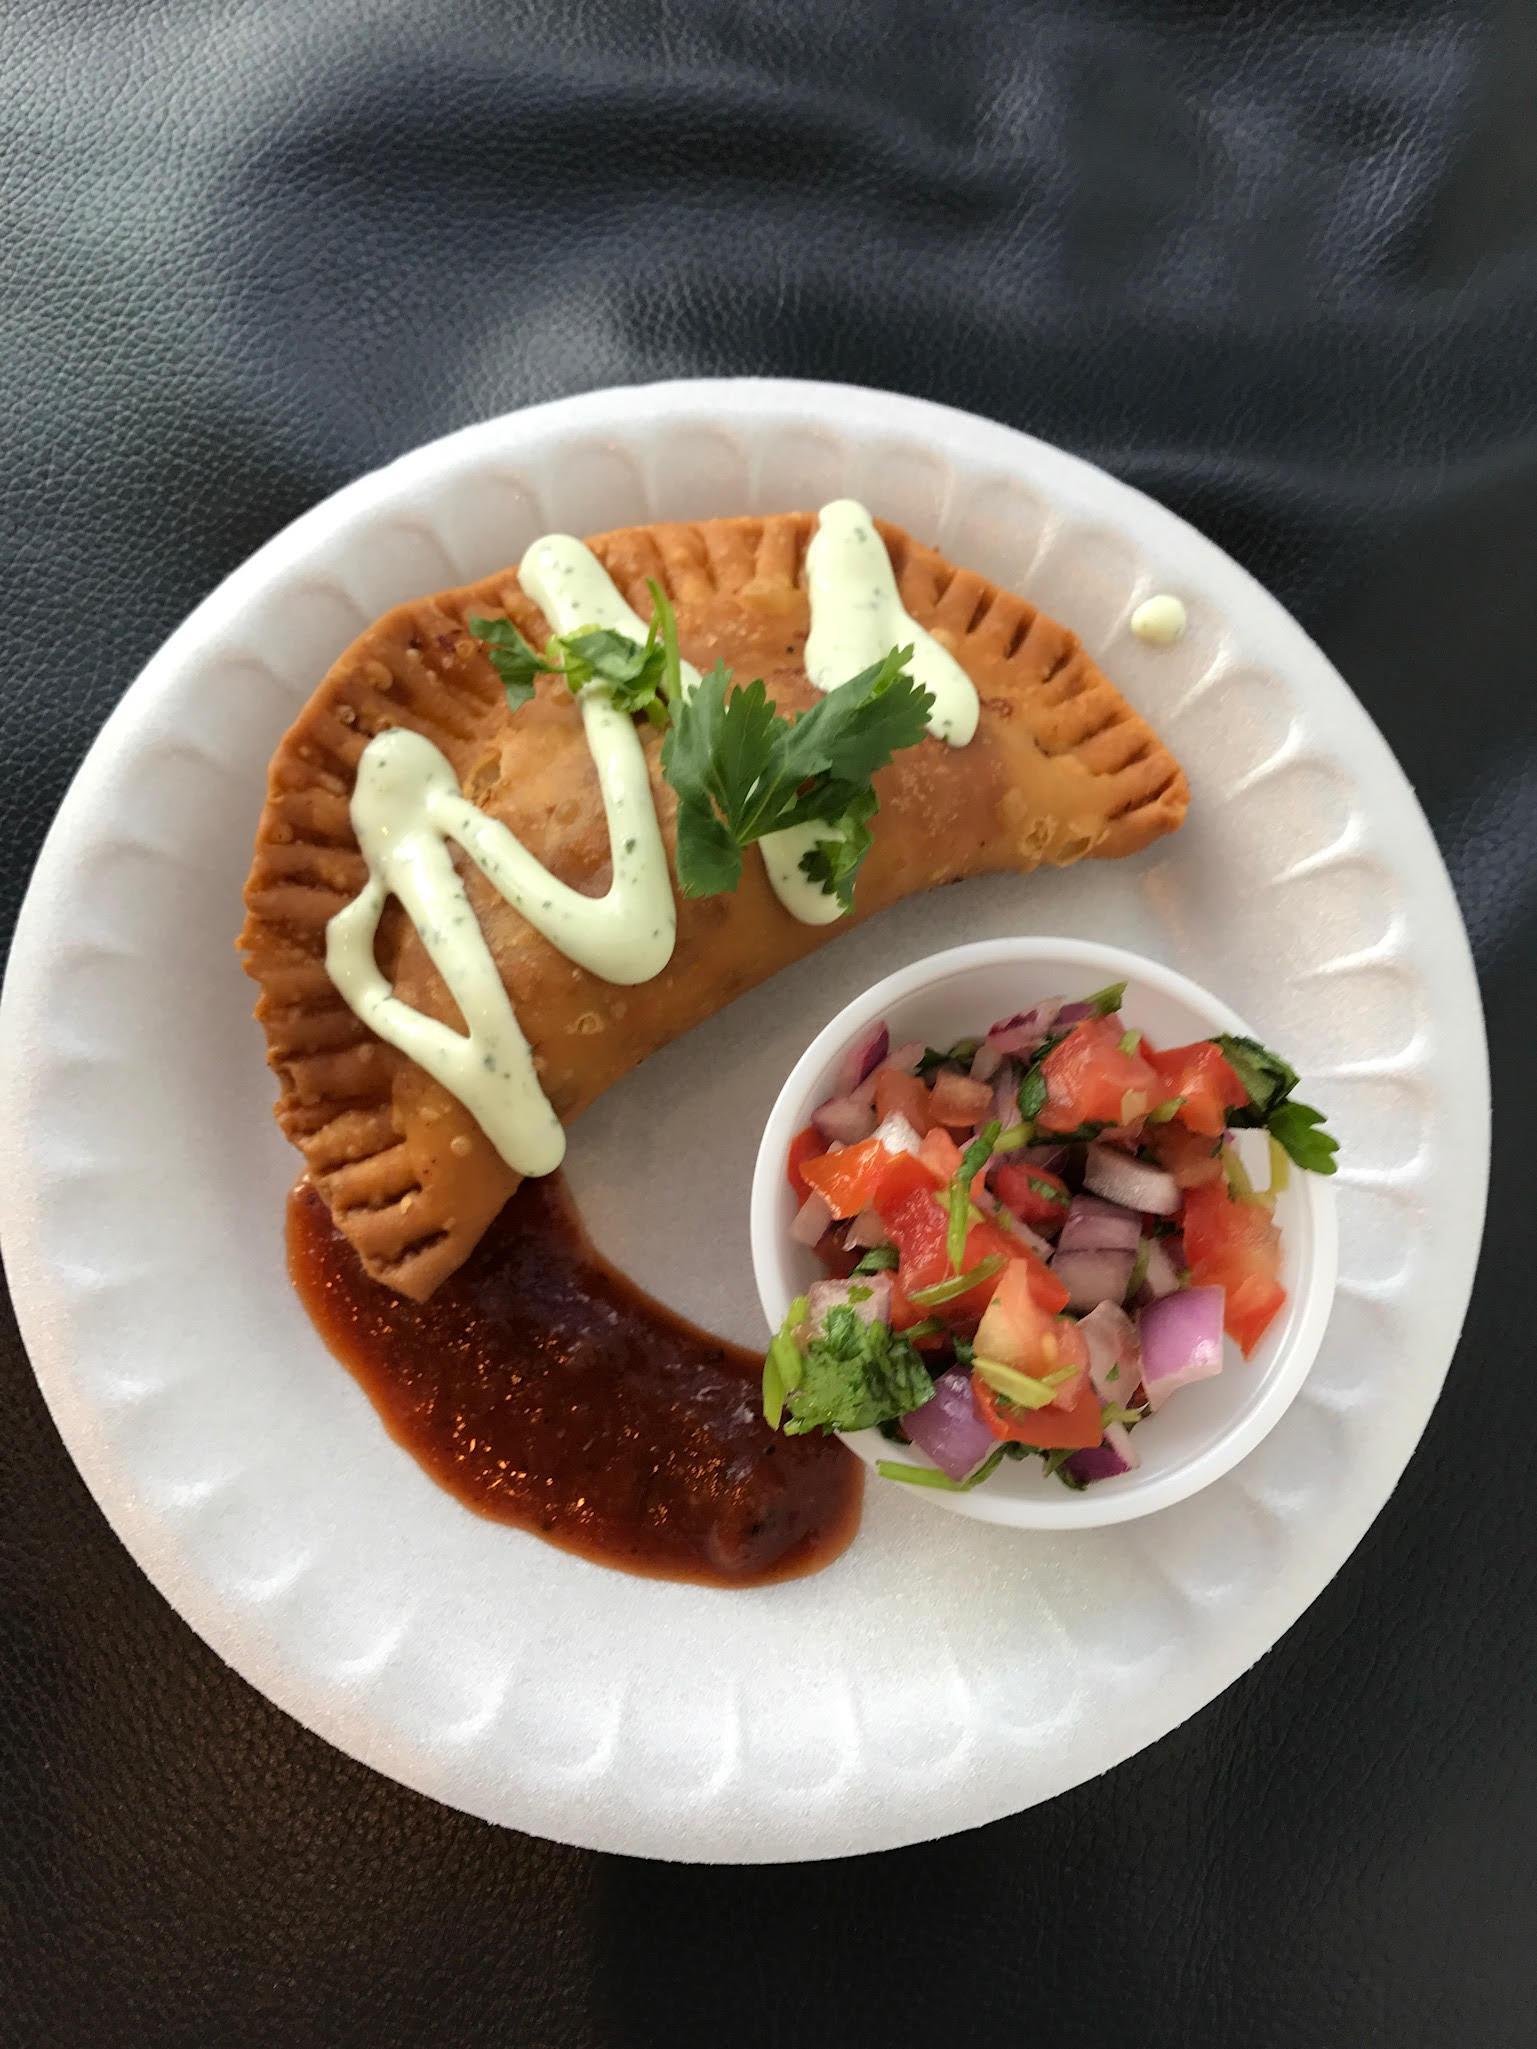 Vanderbilt's Hilton Garden Inn's empanada